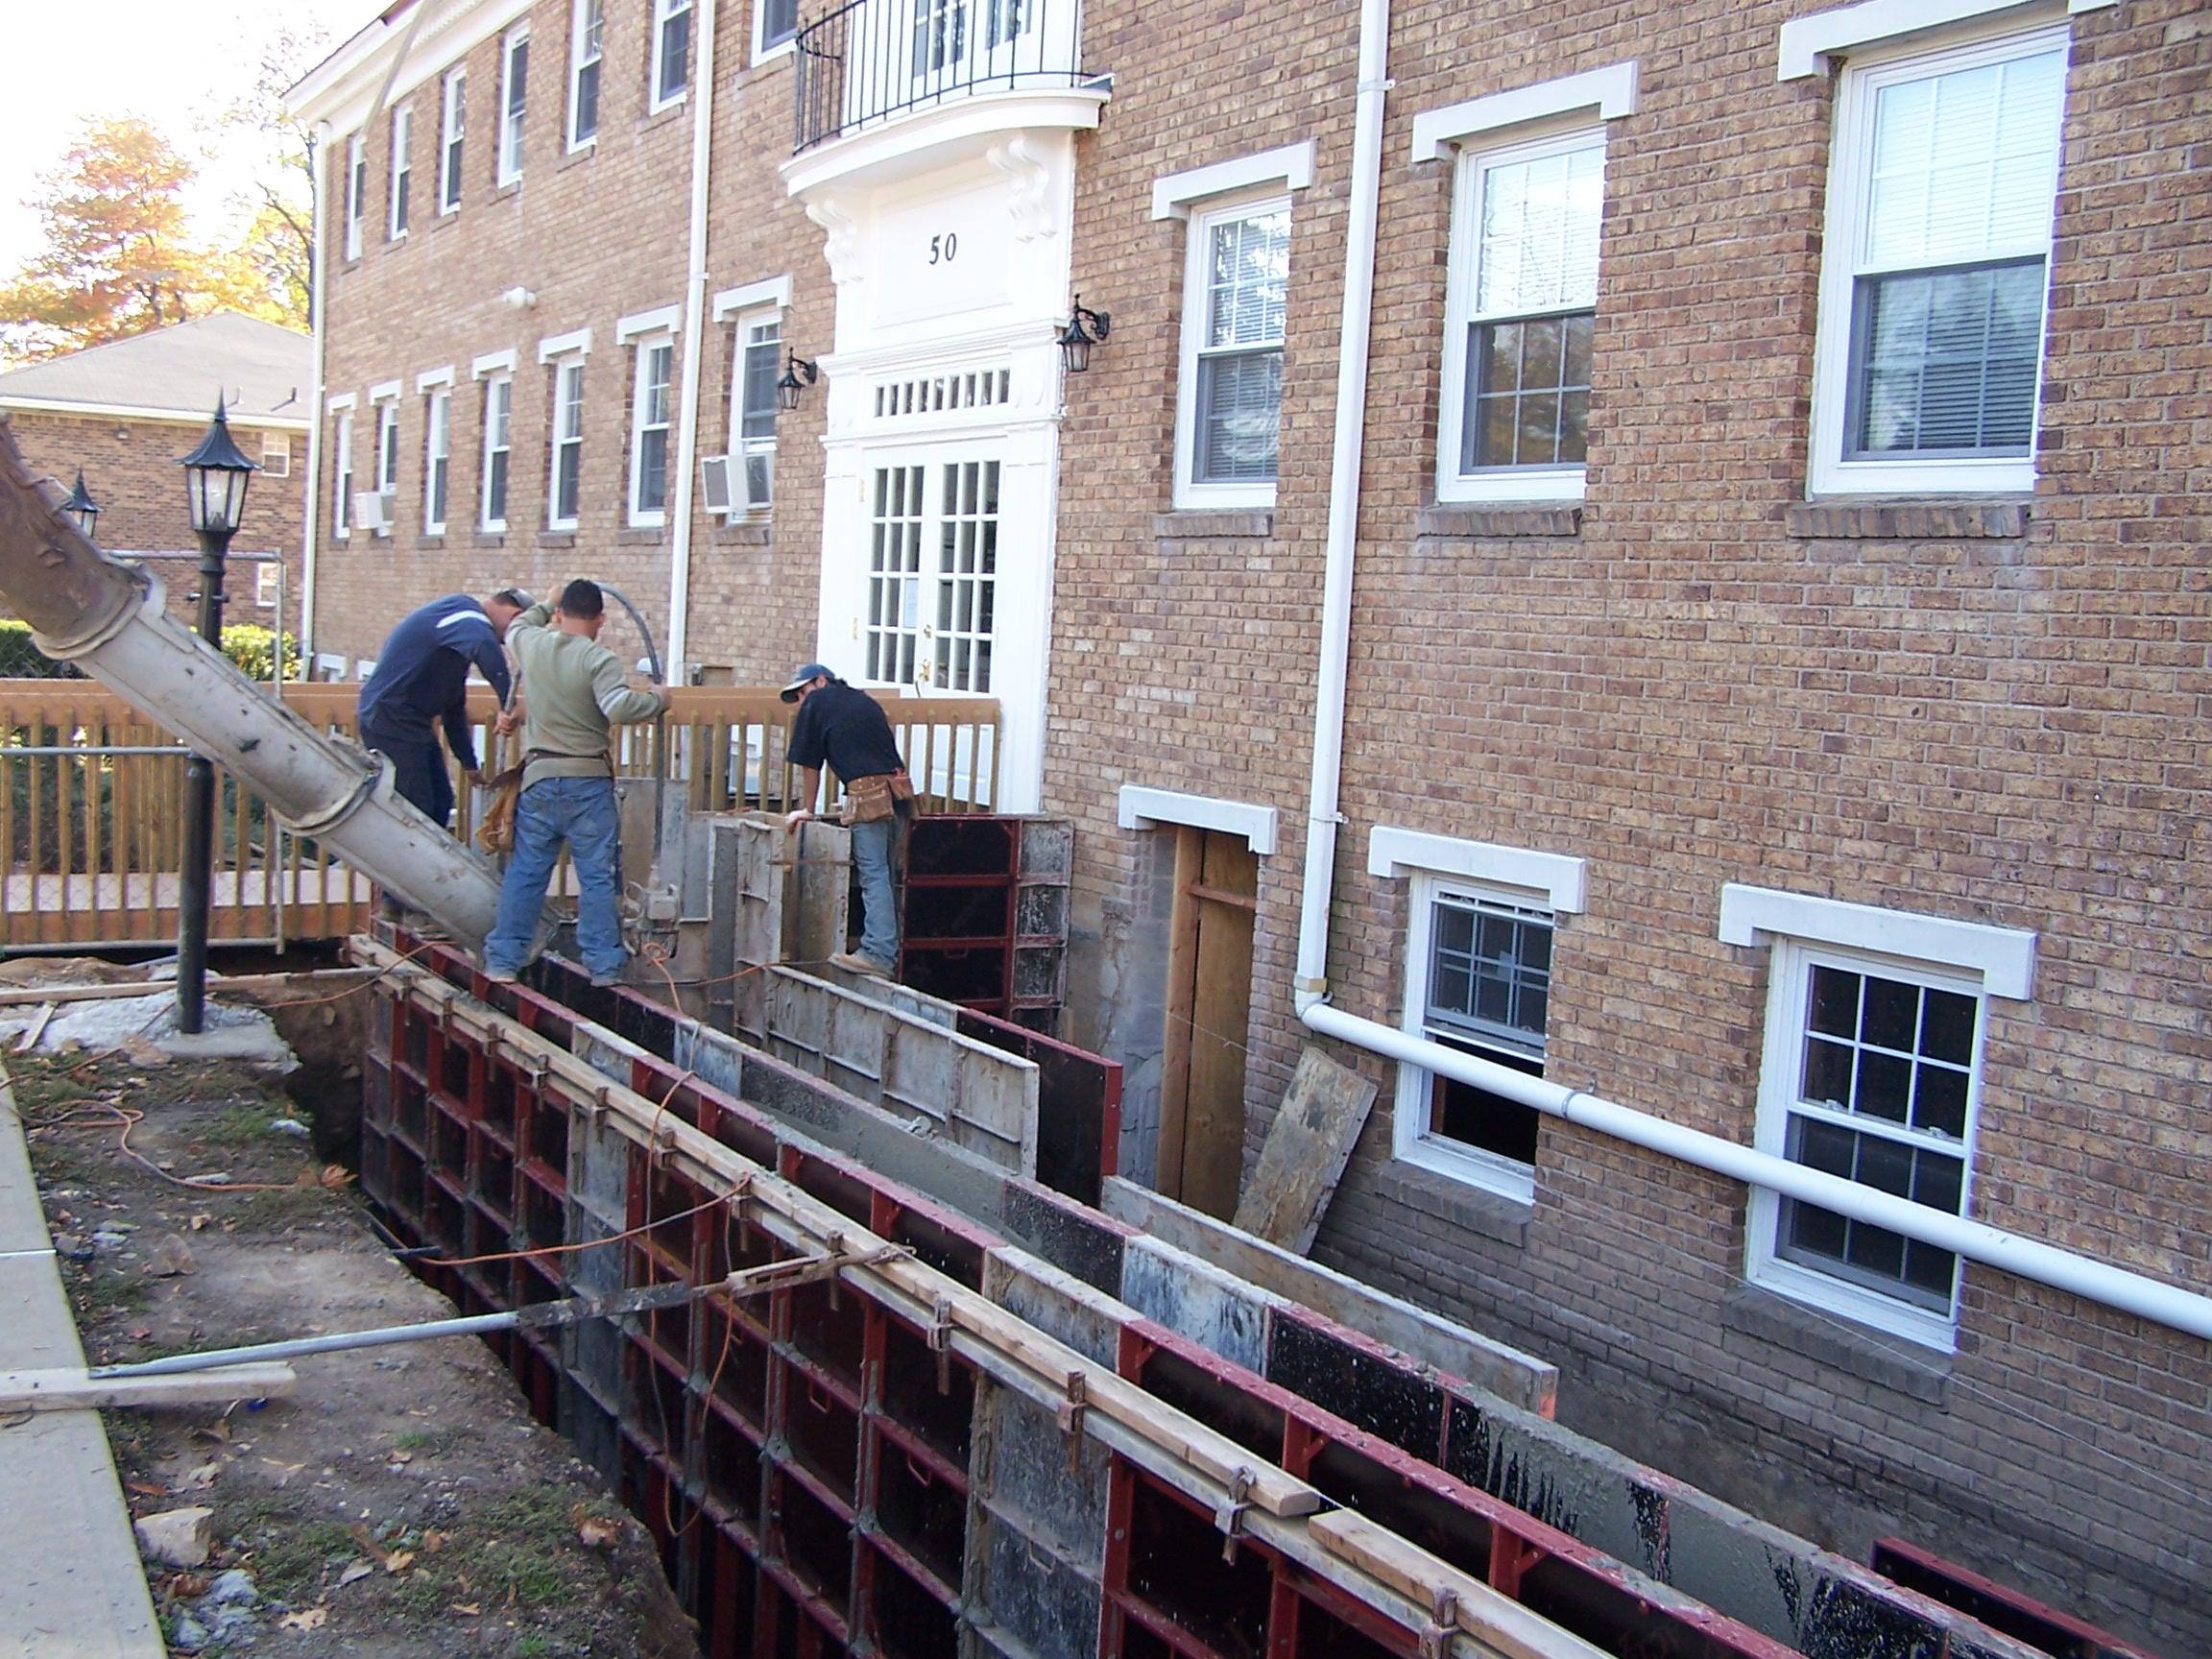 Pouring Handicap Ramp Walls